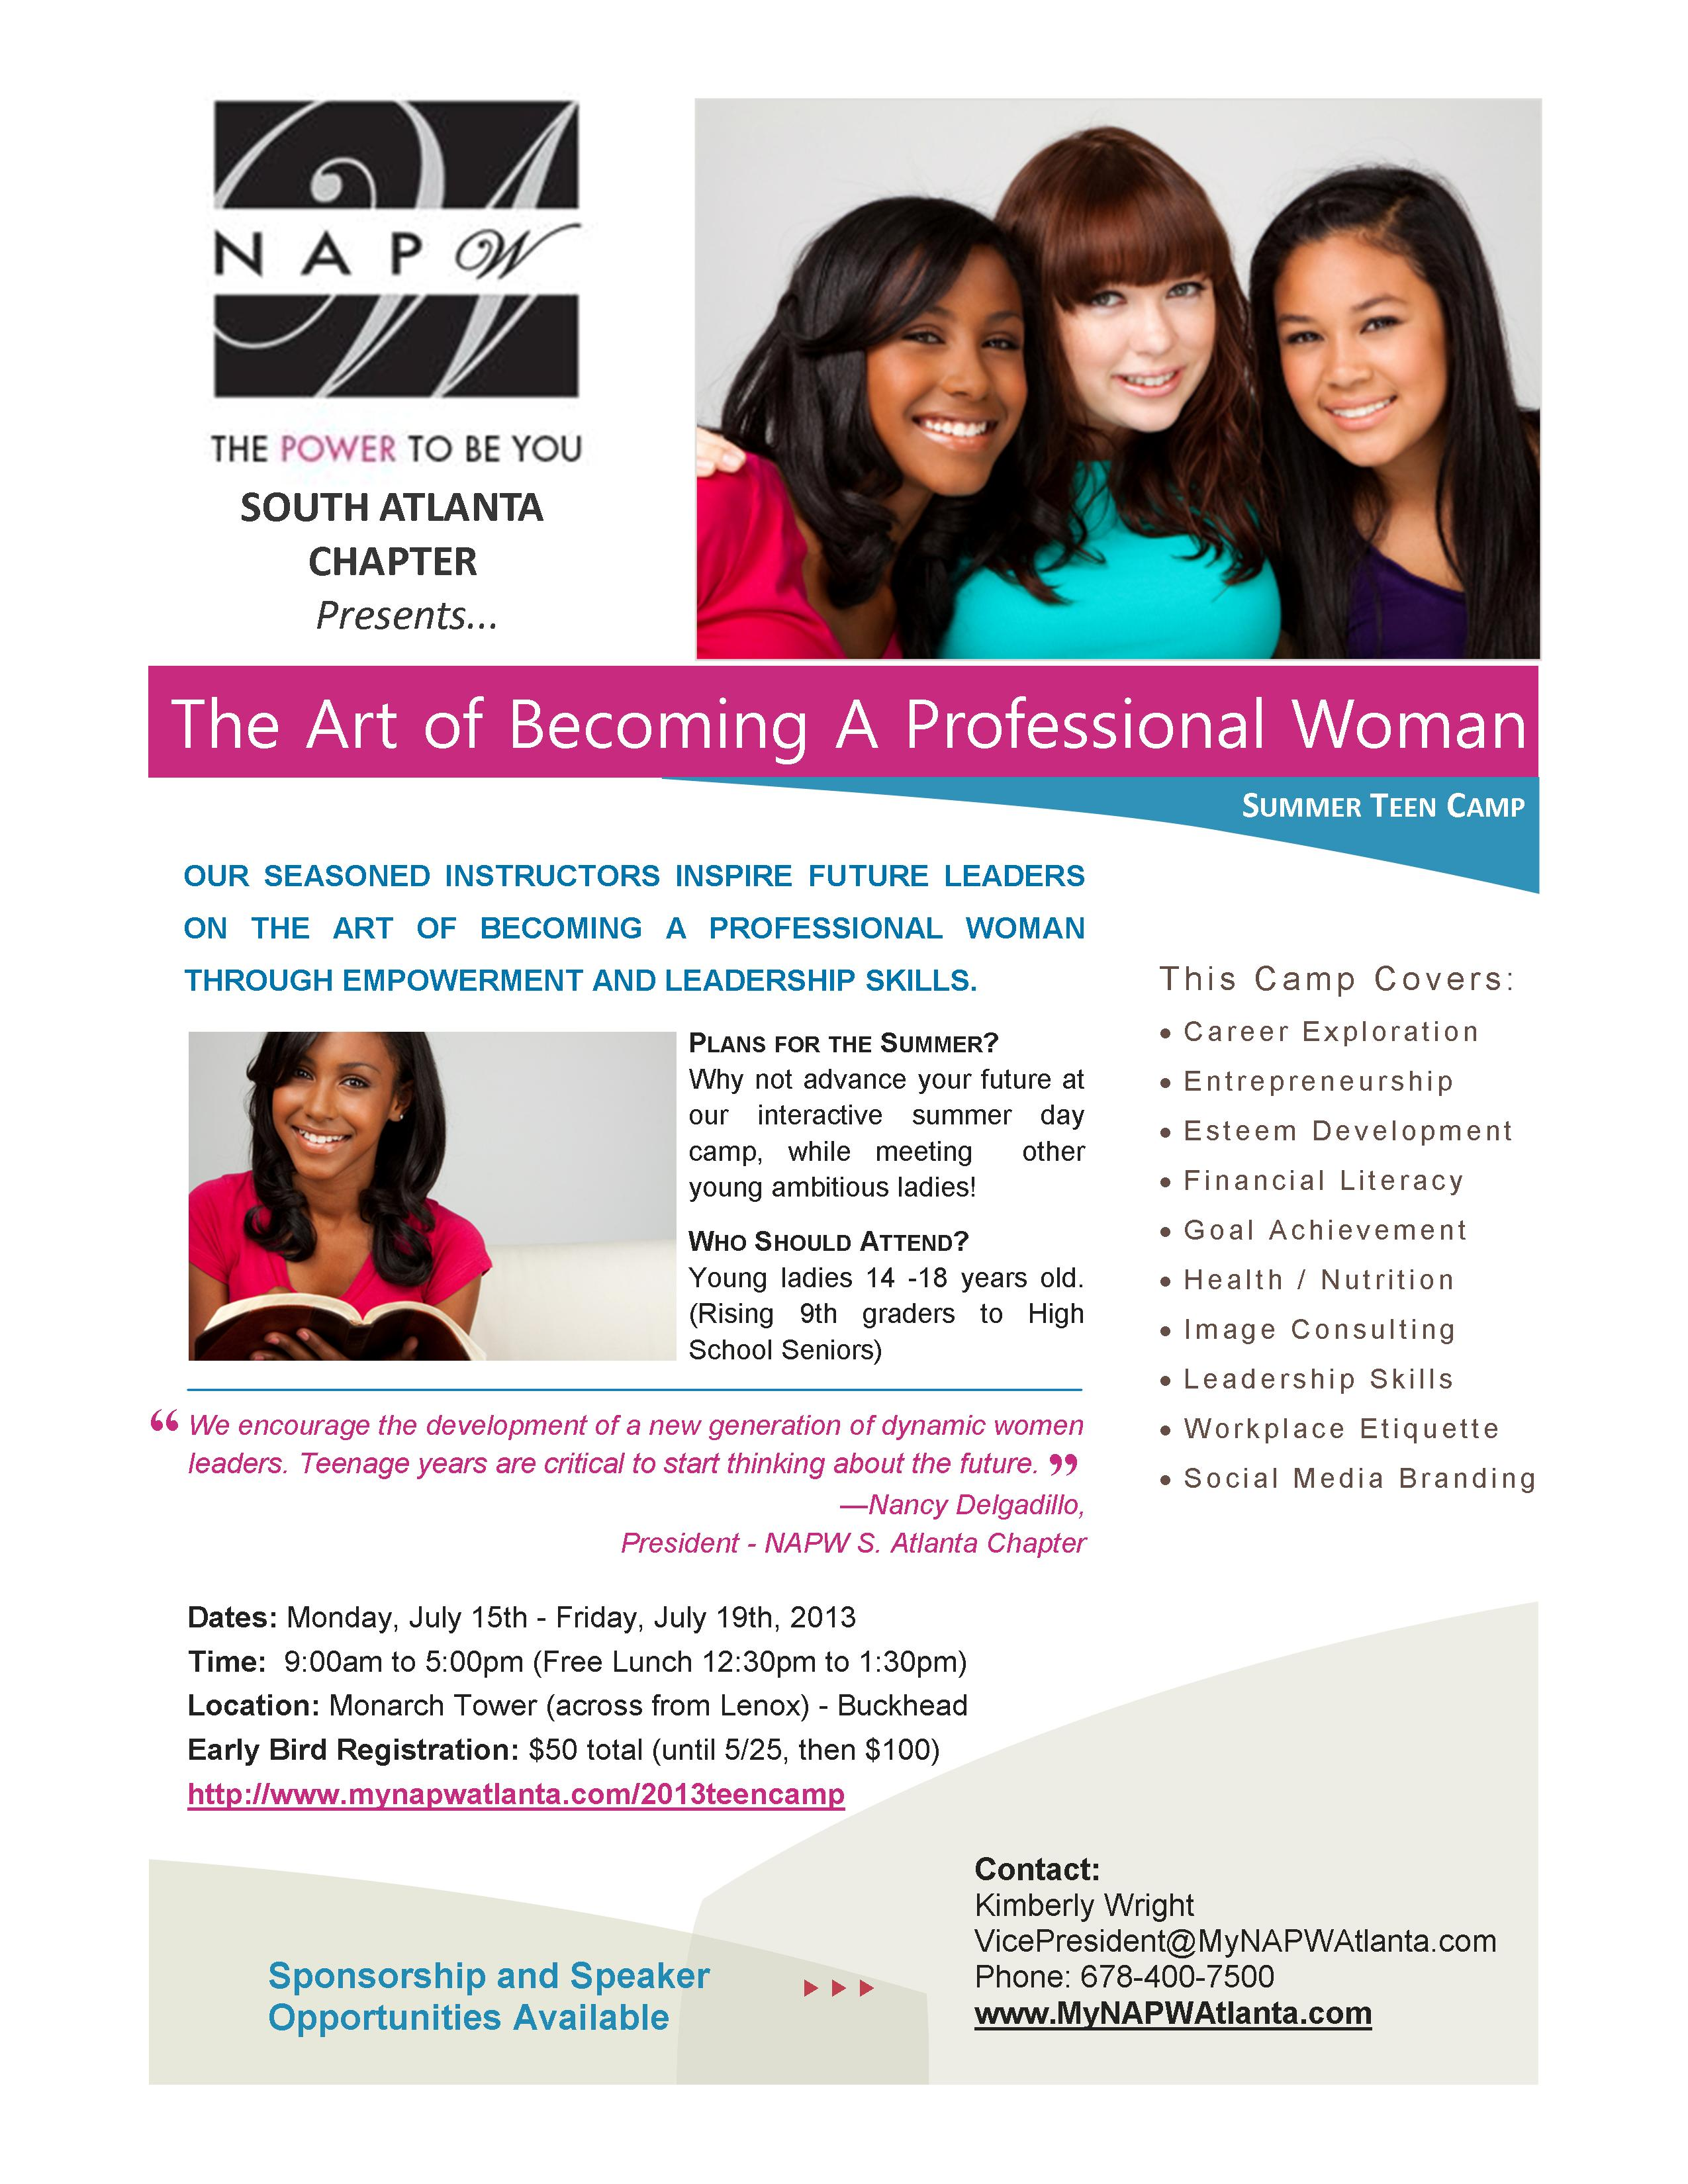 NAPW Atlanta Summer Teen Empowerment Camp